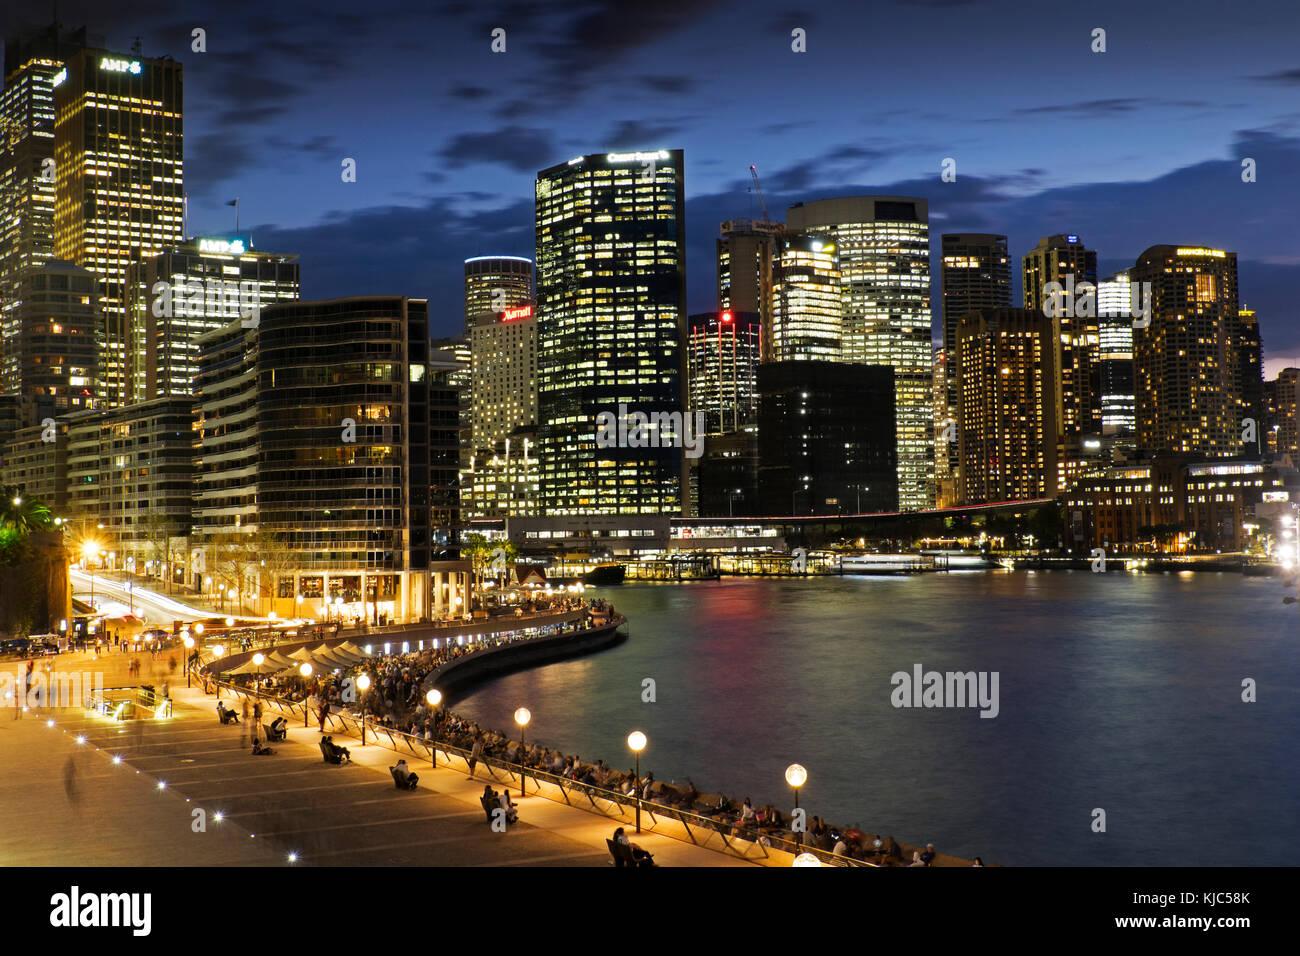 Seaside Promenade at the Circular Quay and Sydney skyline at dusk, Australia - Stock Image